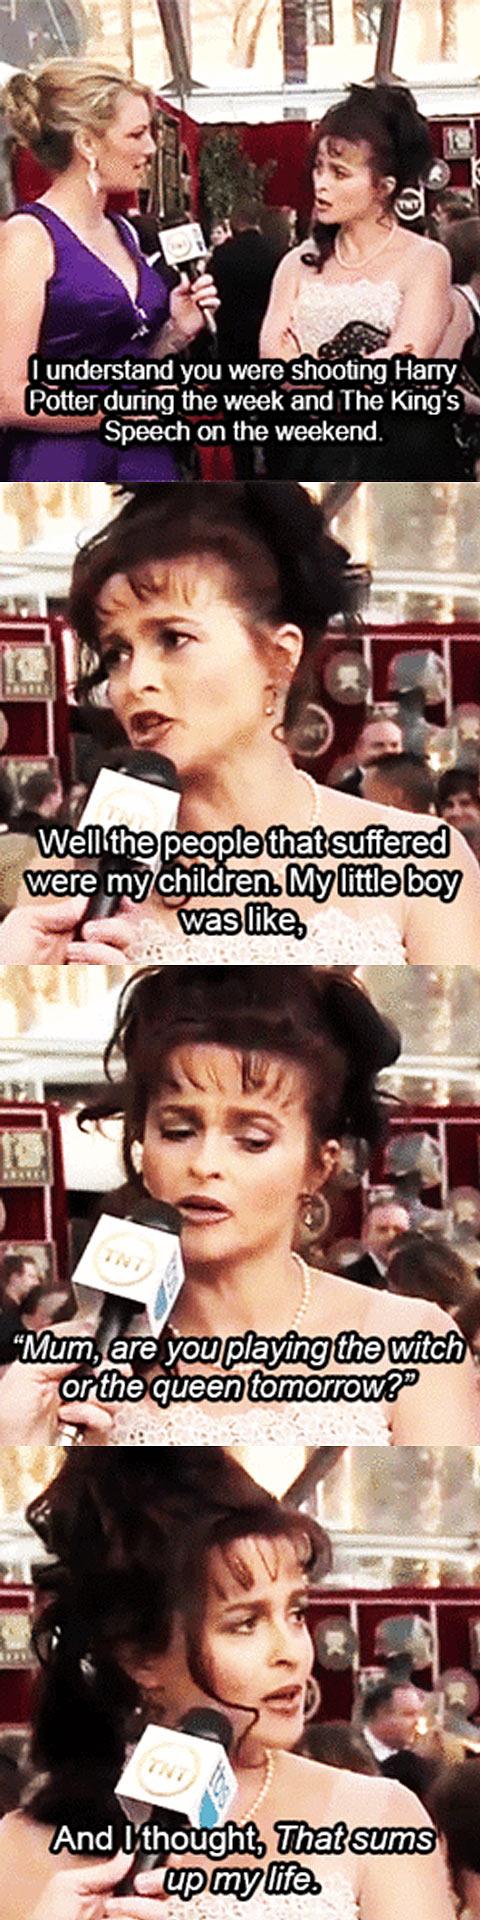 Helena Bonham Carter at the 2011 SAG Awards…